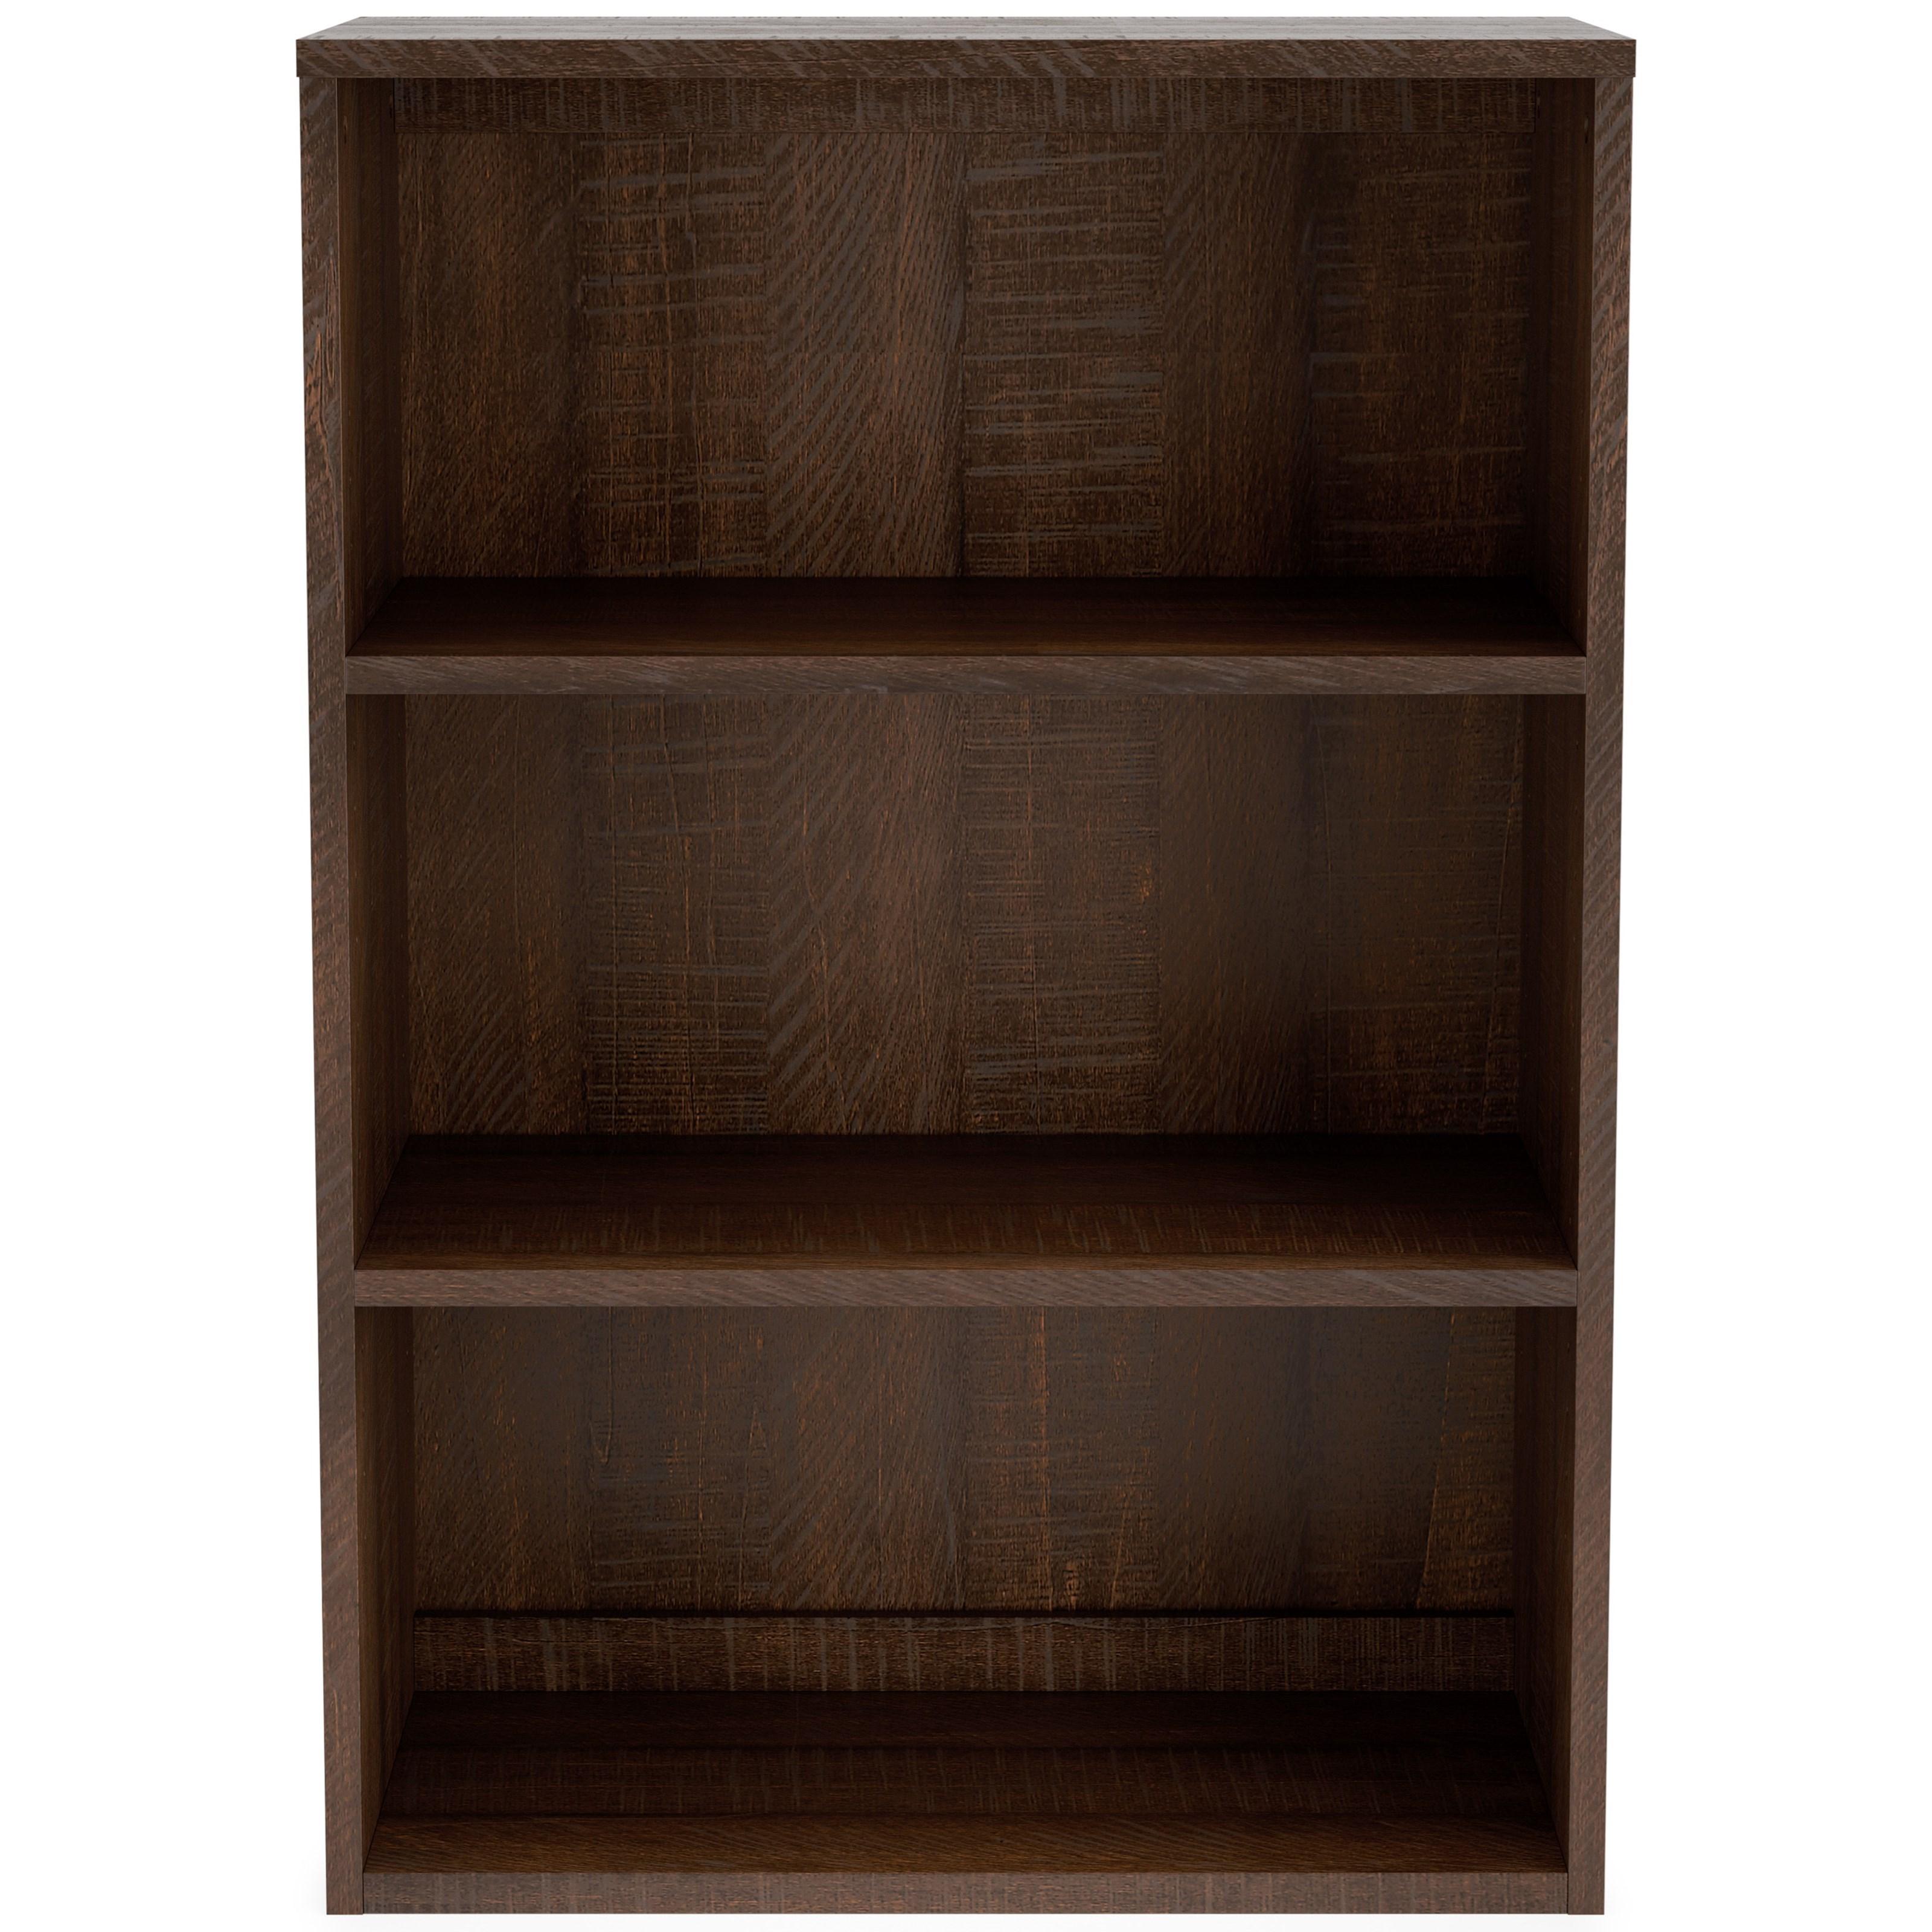 Camiburg Medium Bookcase  by Signature Design by Ashley at Sam Levitz Furniture